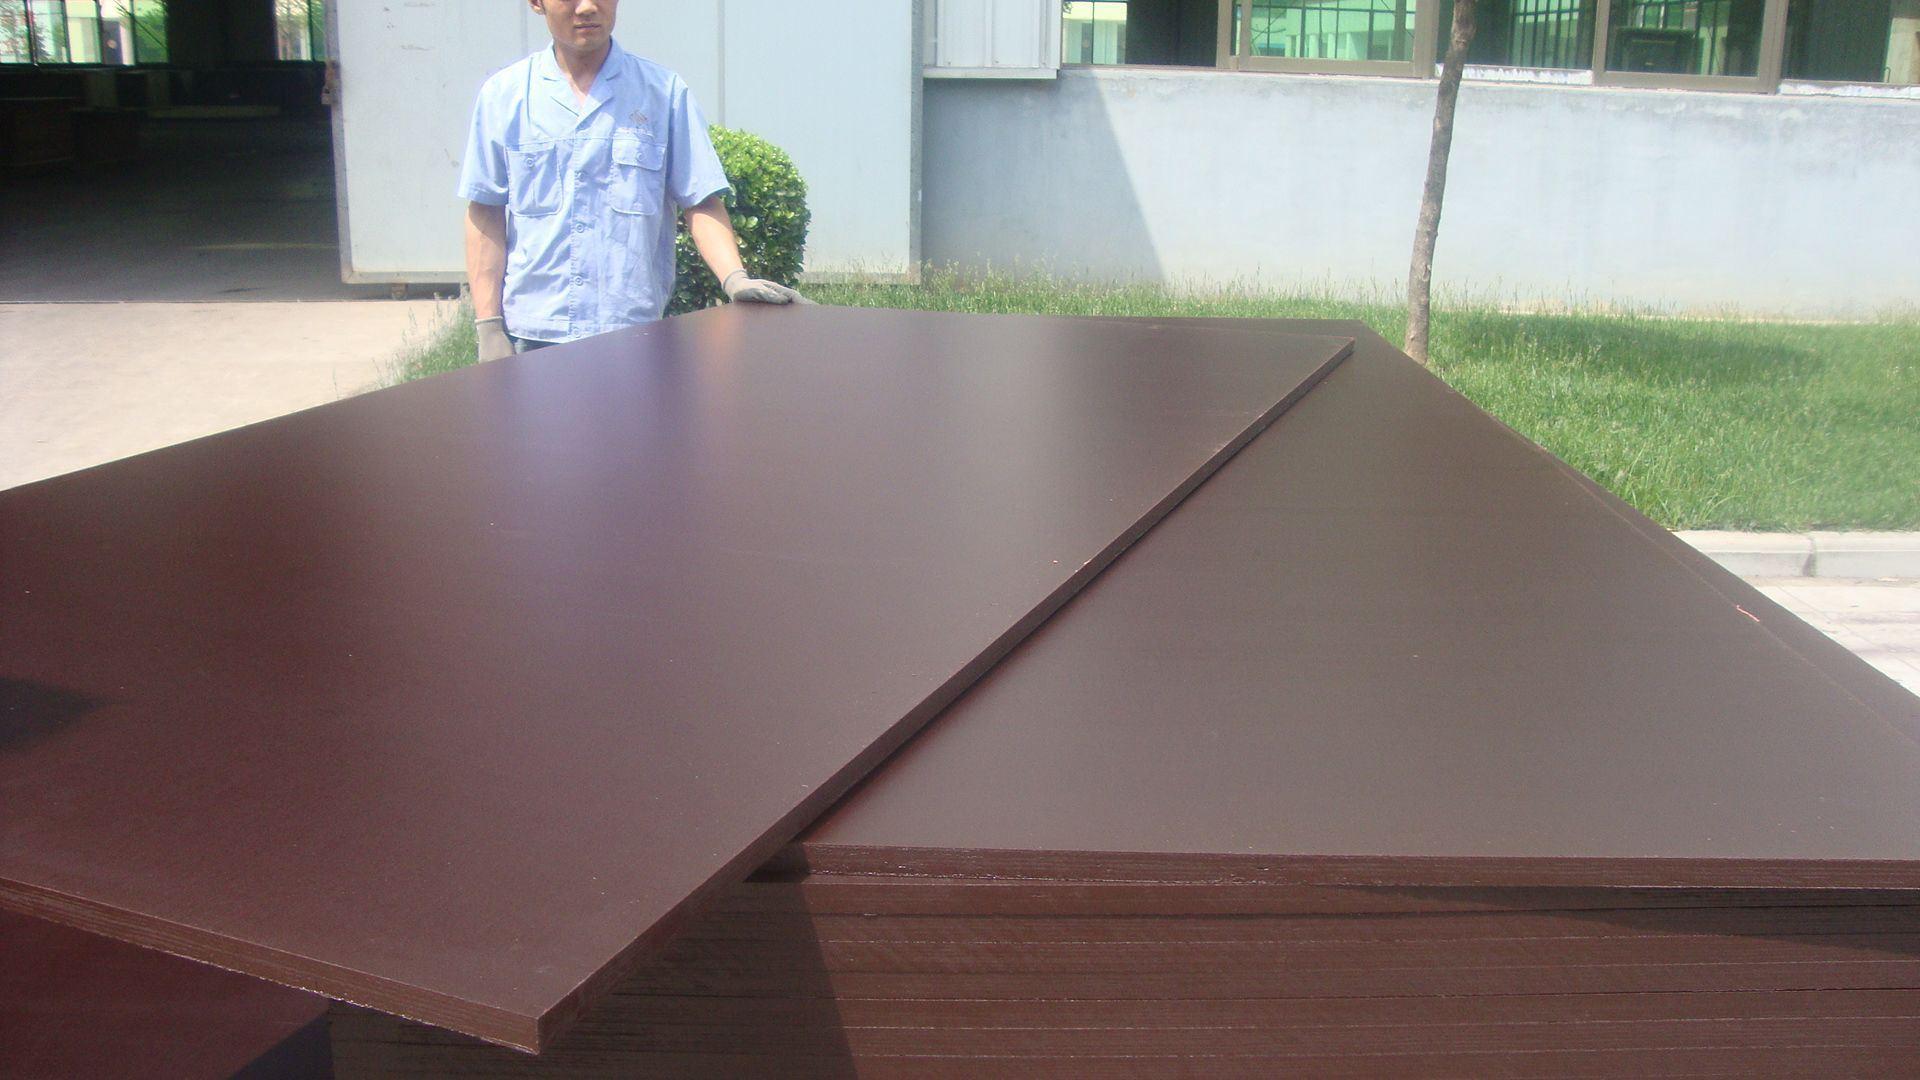 Coffrage en contreplaqu brun film face contre plaqu pour - Plaque contreplaque marine ...